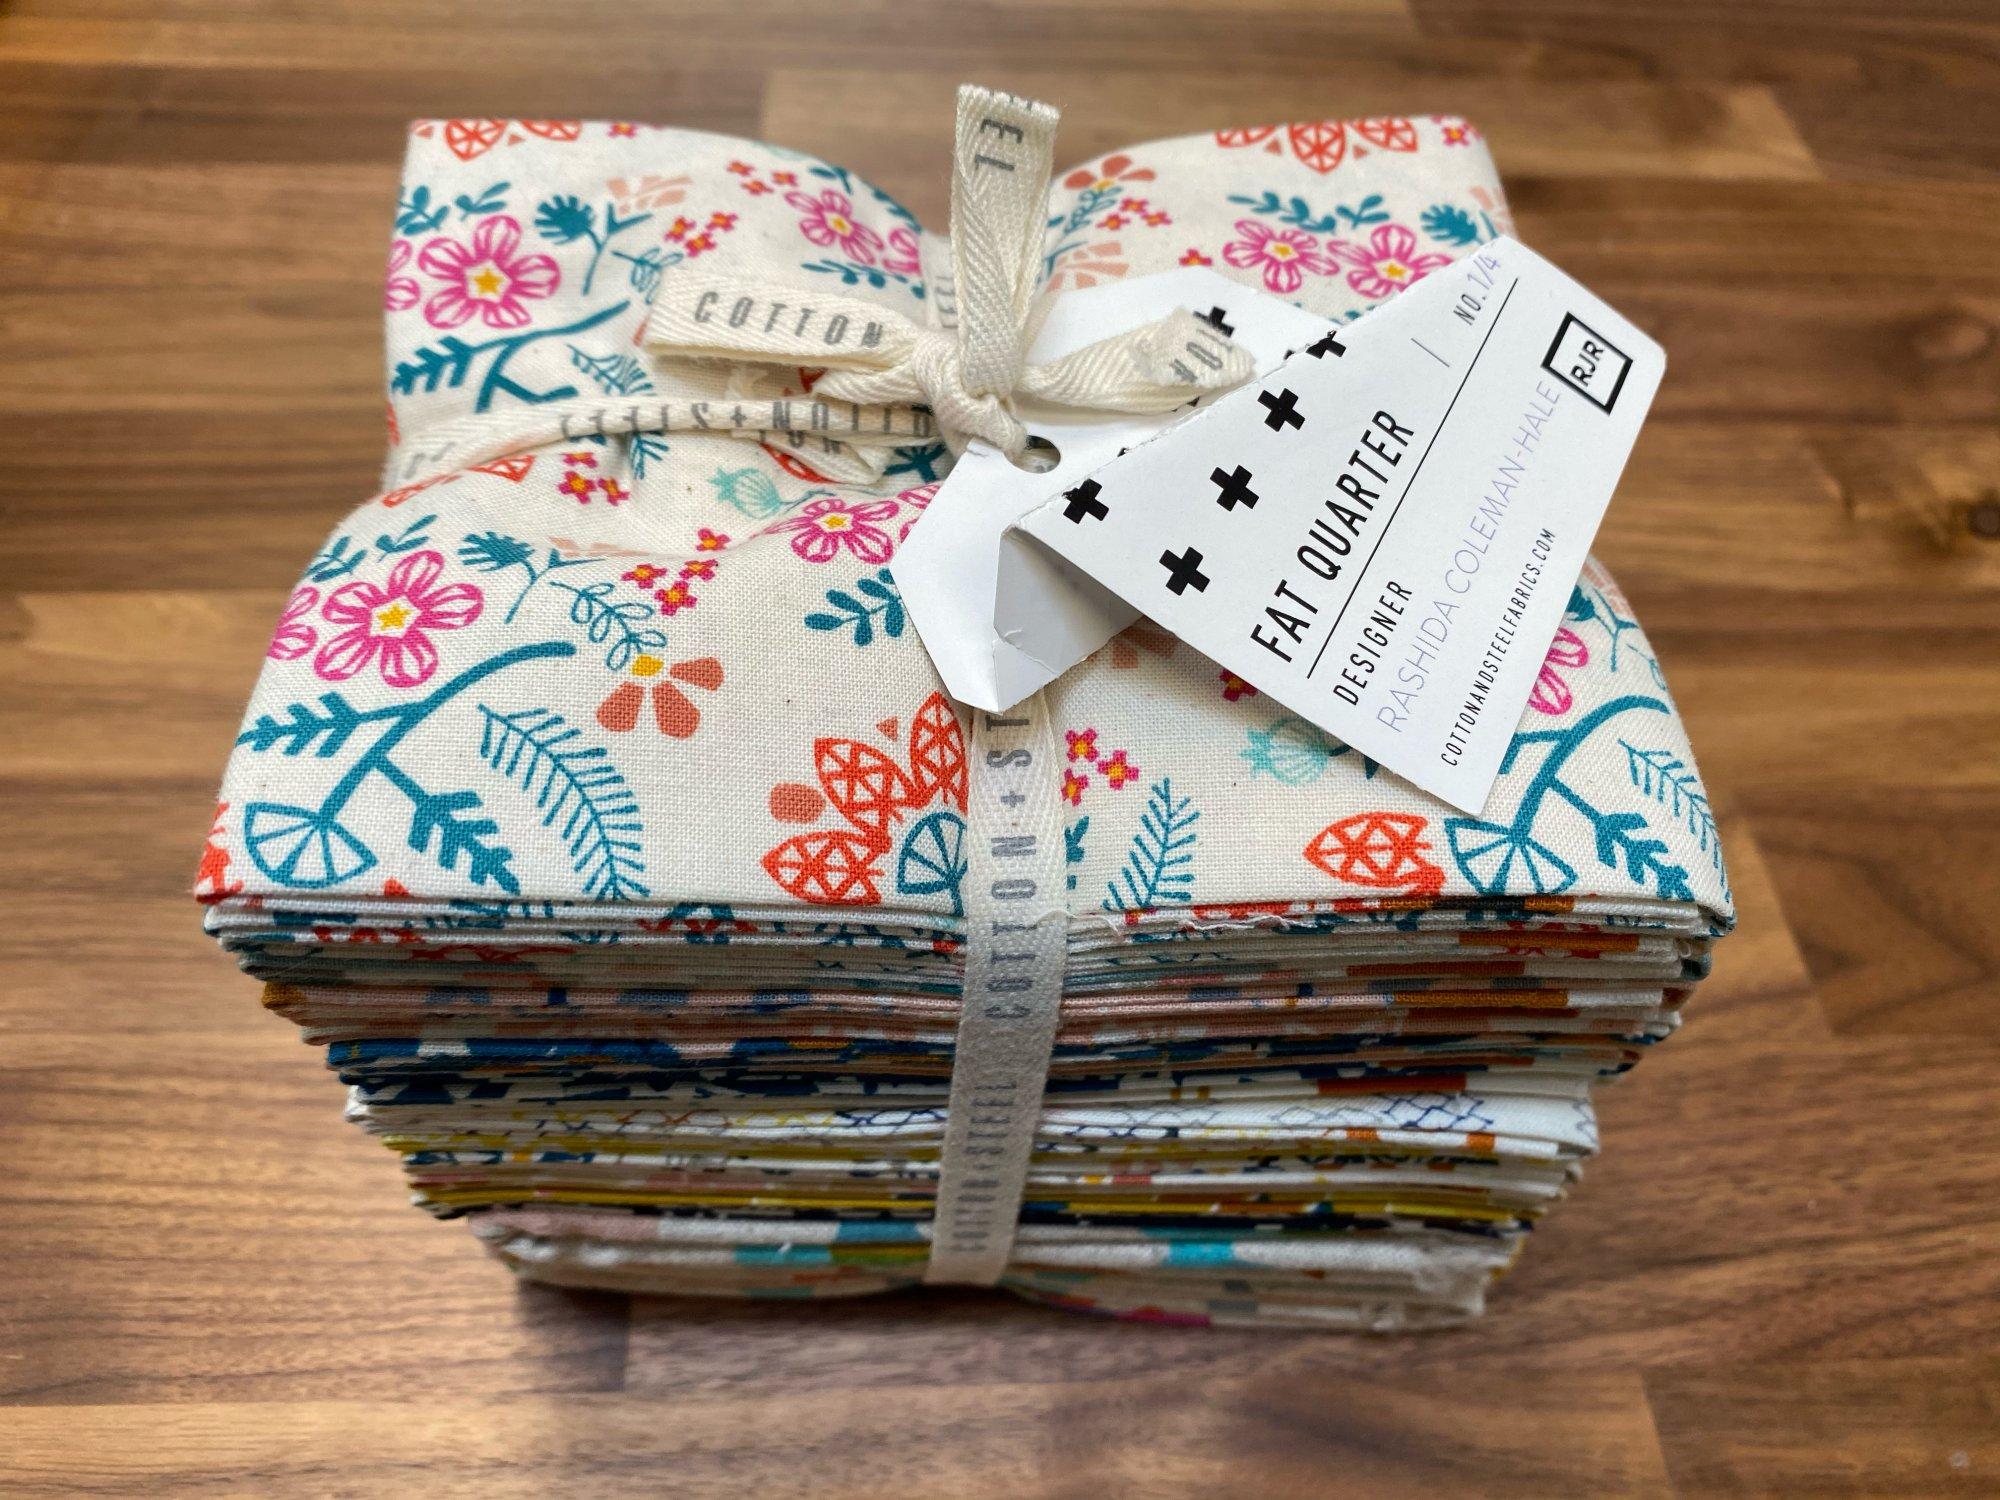 Paper Cuts FQB (Rashida Coleman-Hale)